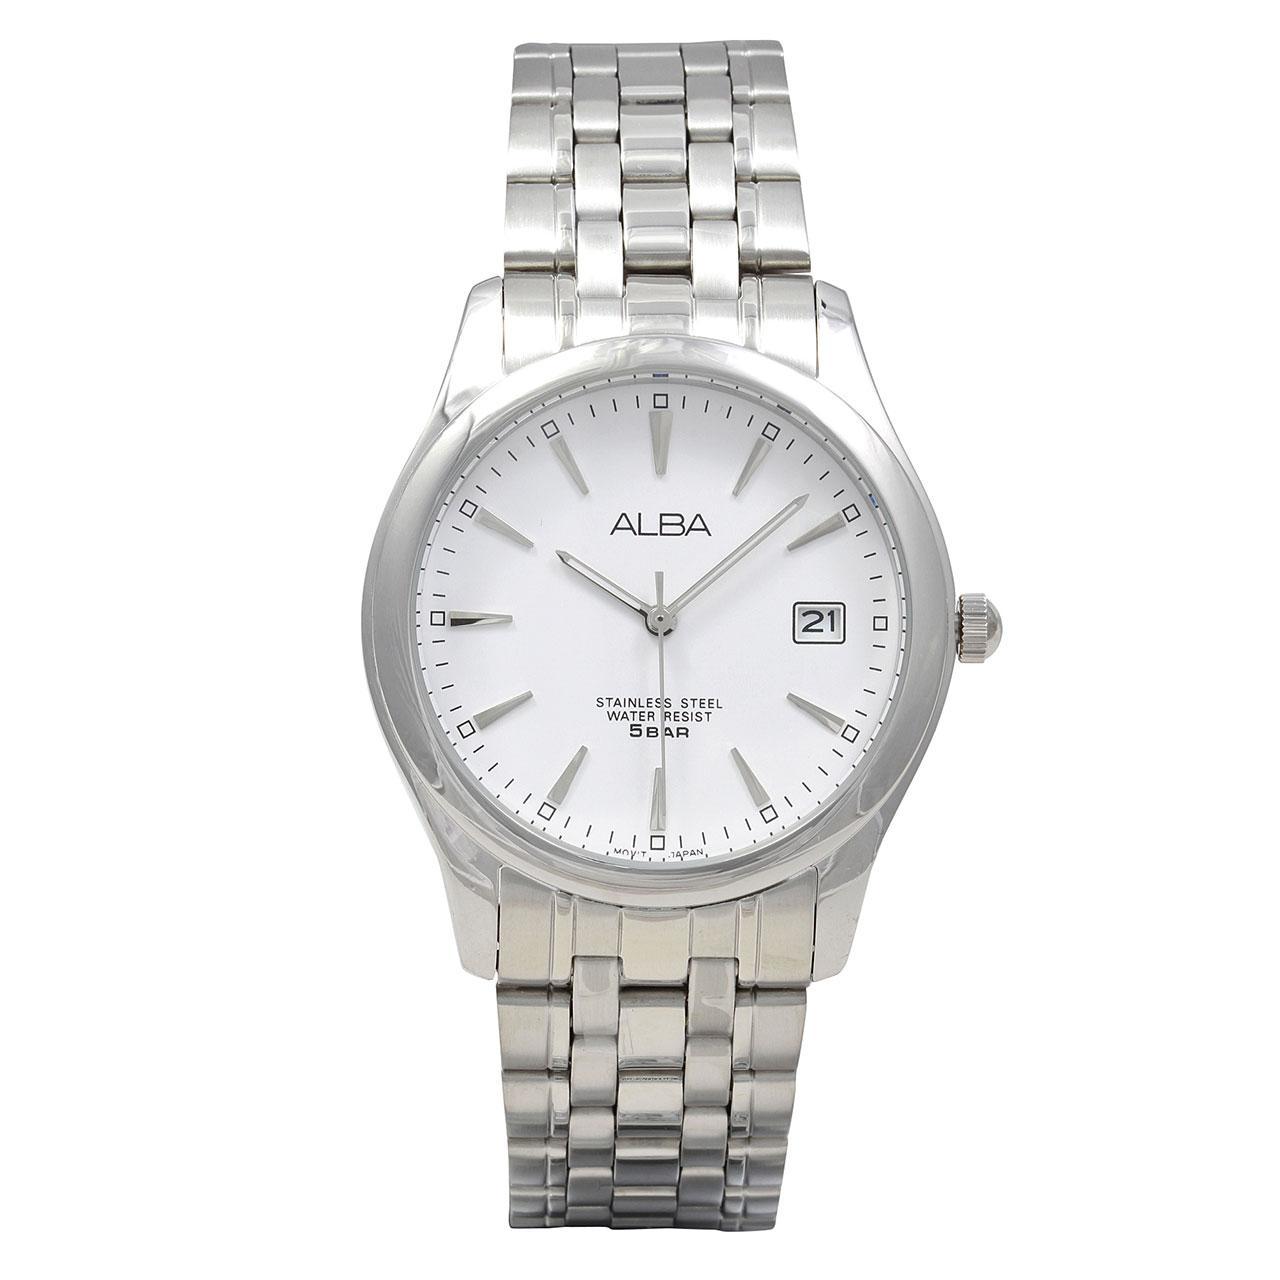 ALBA Jam Tangan Pria - Silver White - Stainless Steel - c